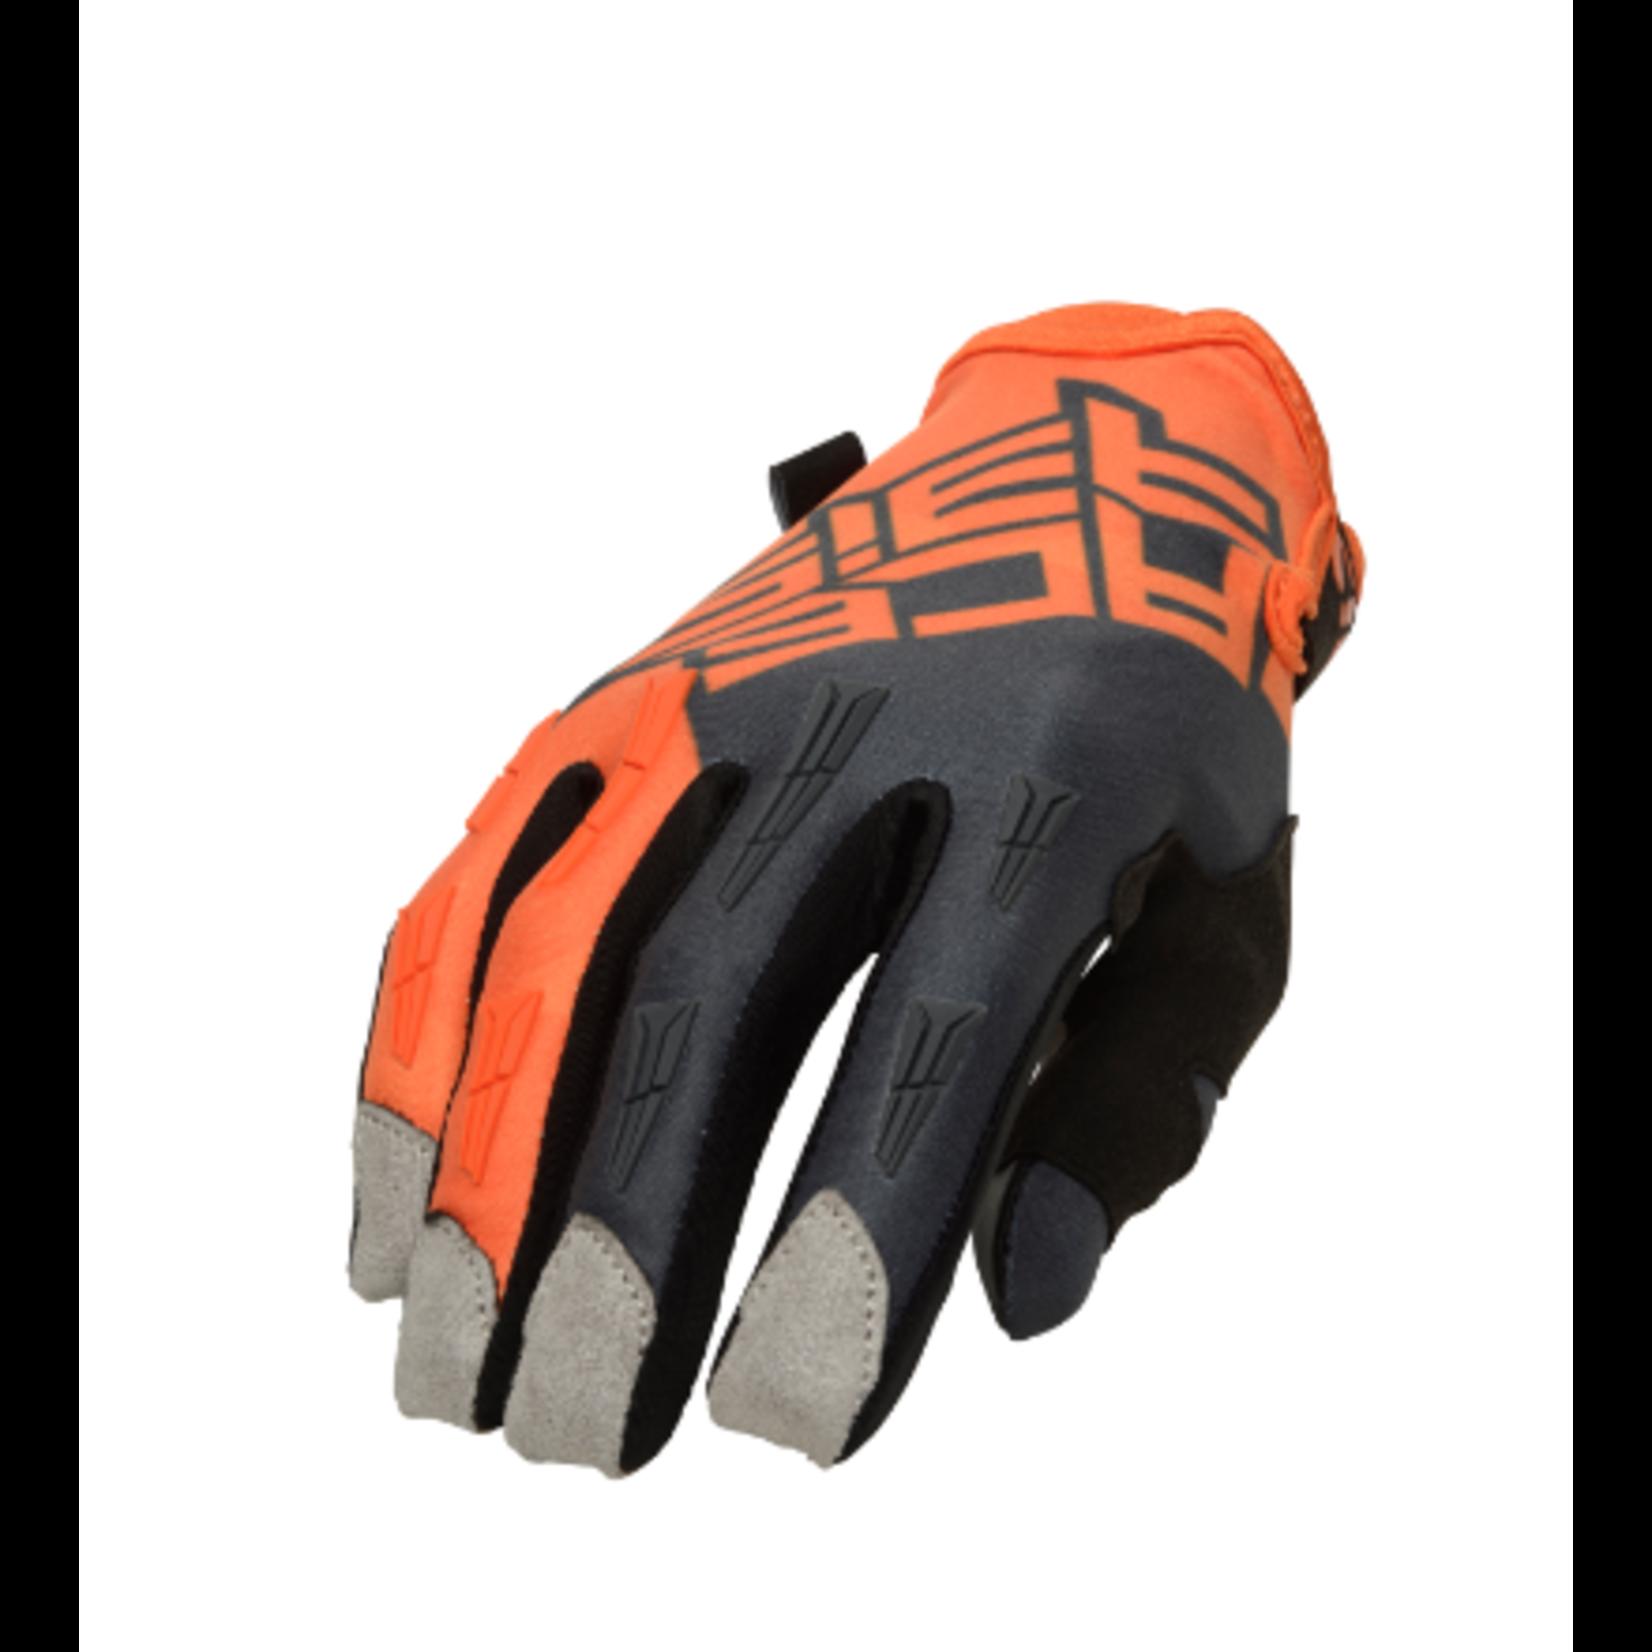 ACERBIS Acerbis Handschuhe MX X-H orange/grey